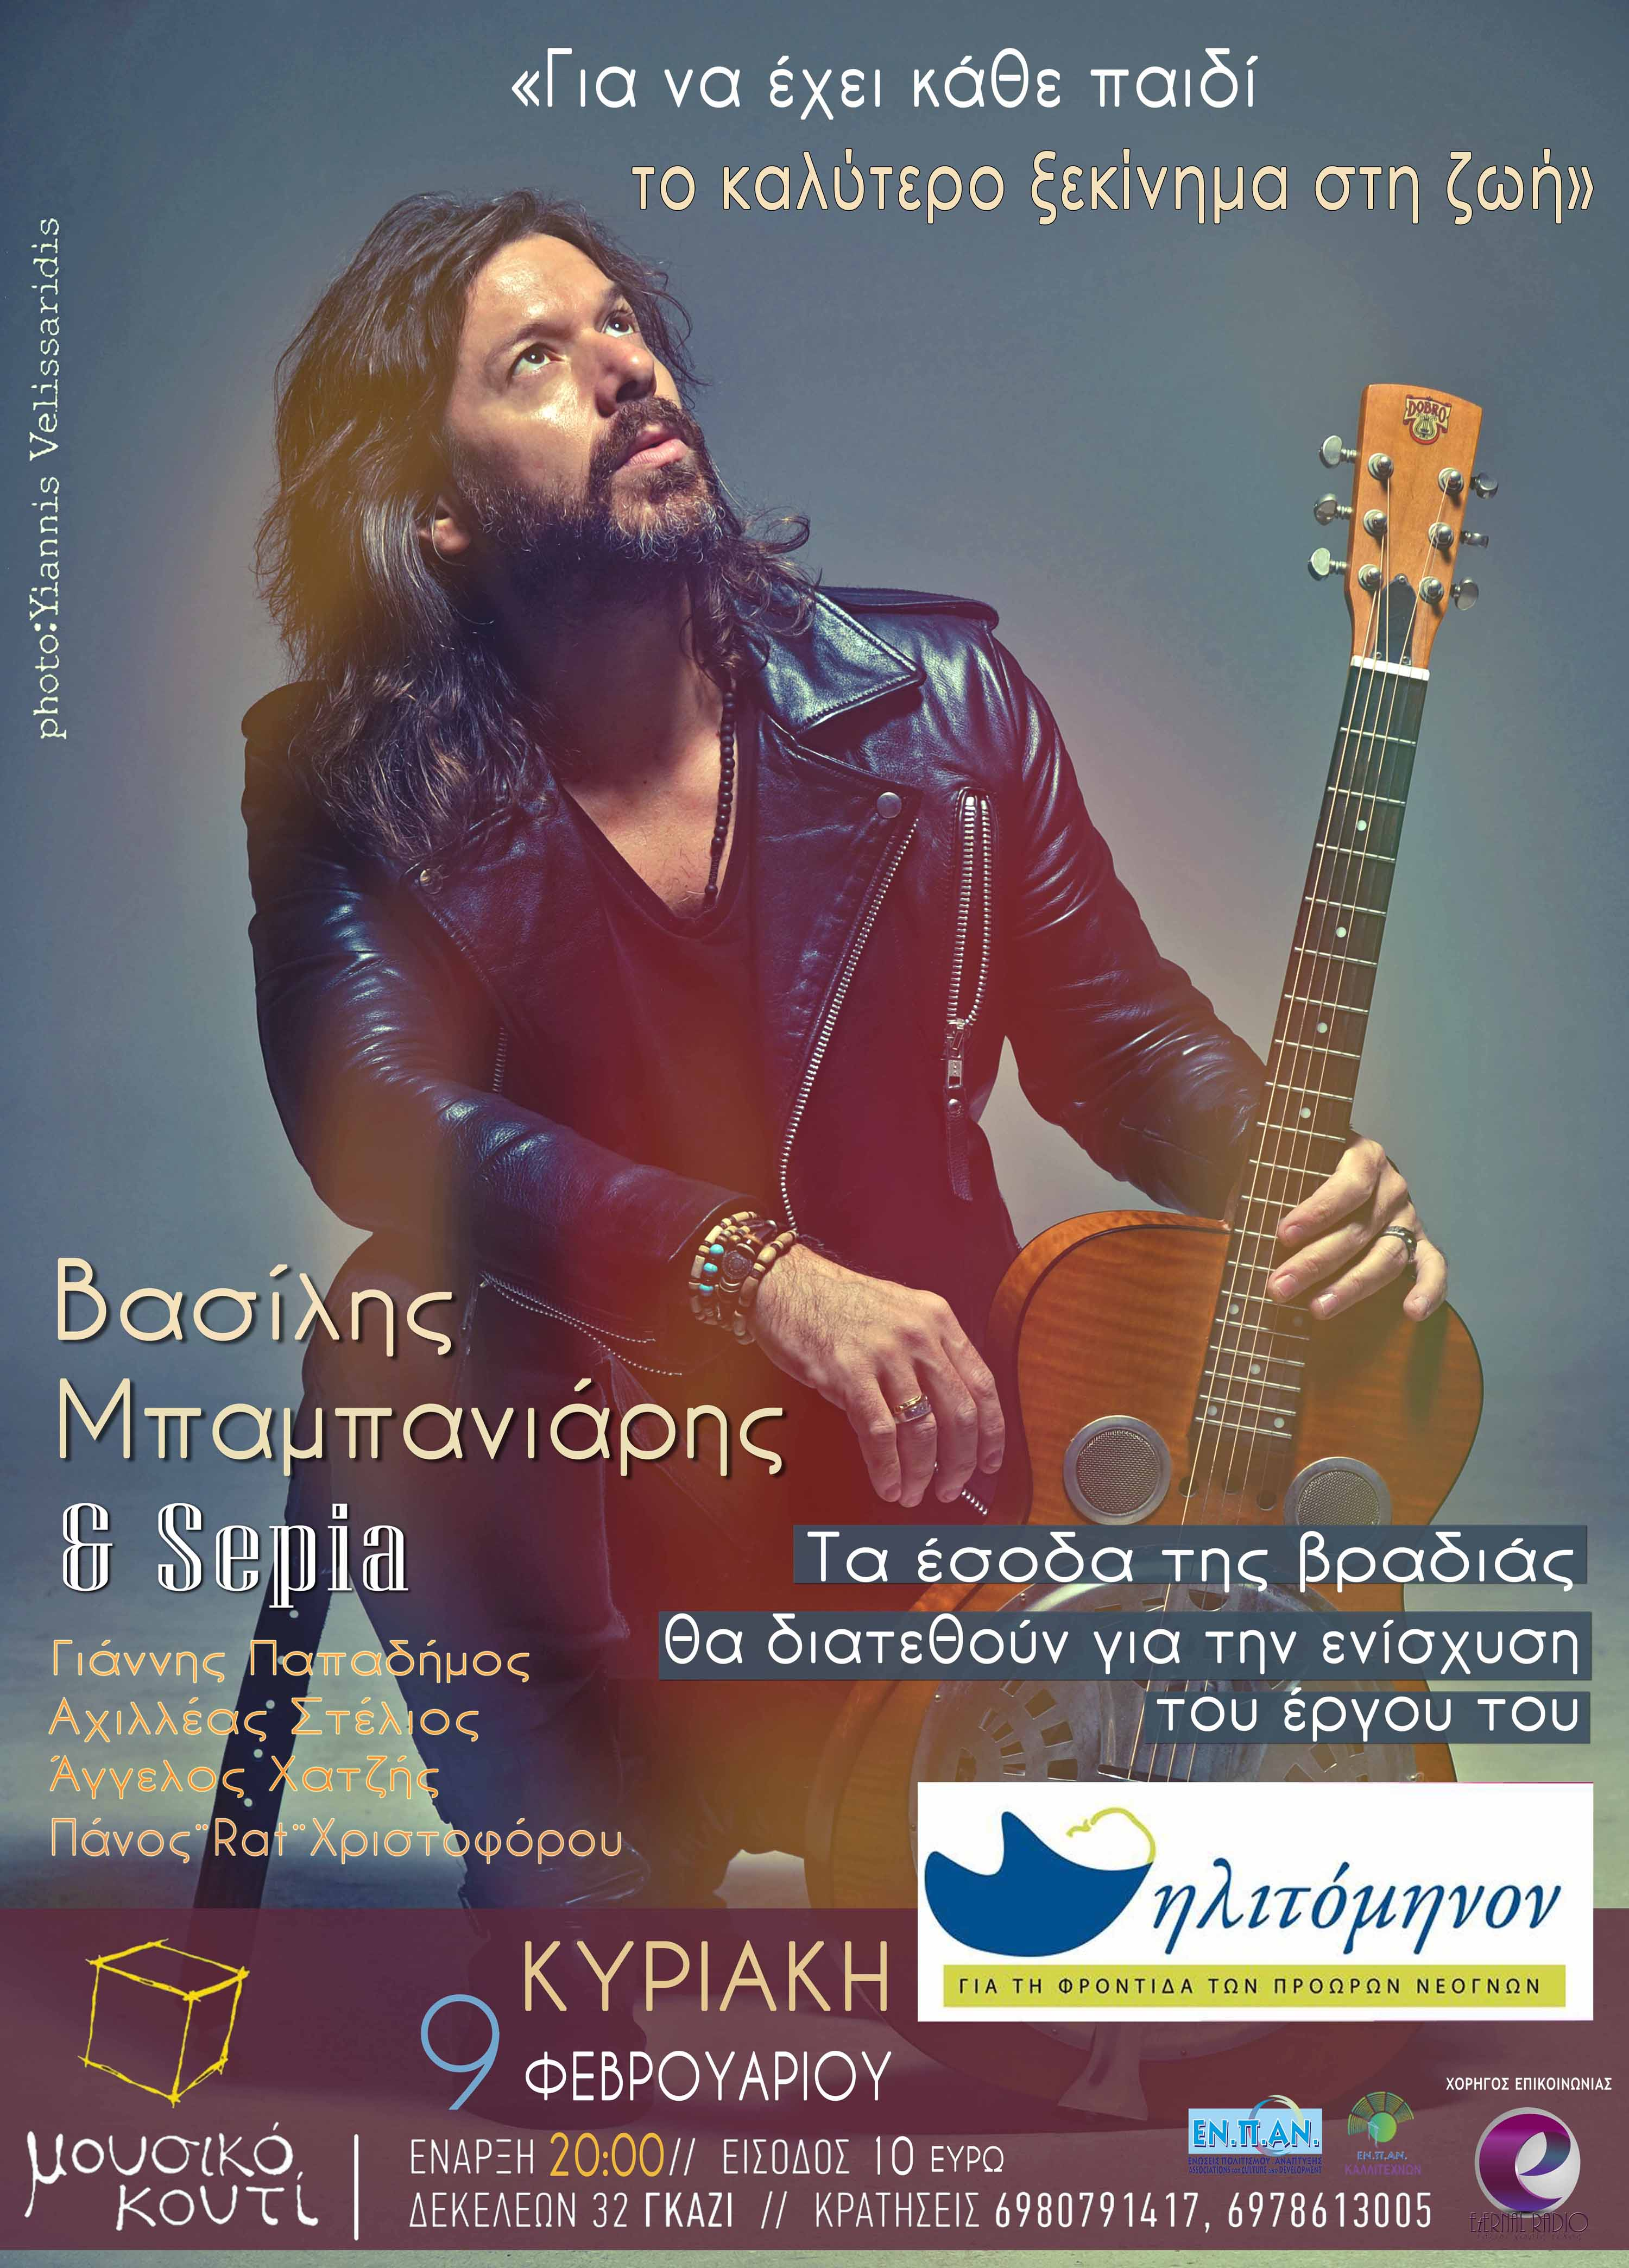 https://www.iapopsi.gr/wp-content/uploads/2020/01/vasilis-mpampaniaris-live-9-fevroyarioy-..jpg